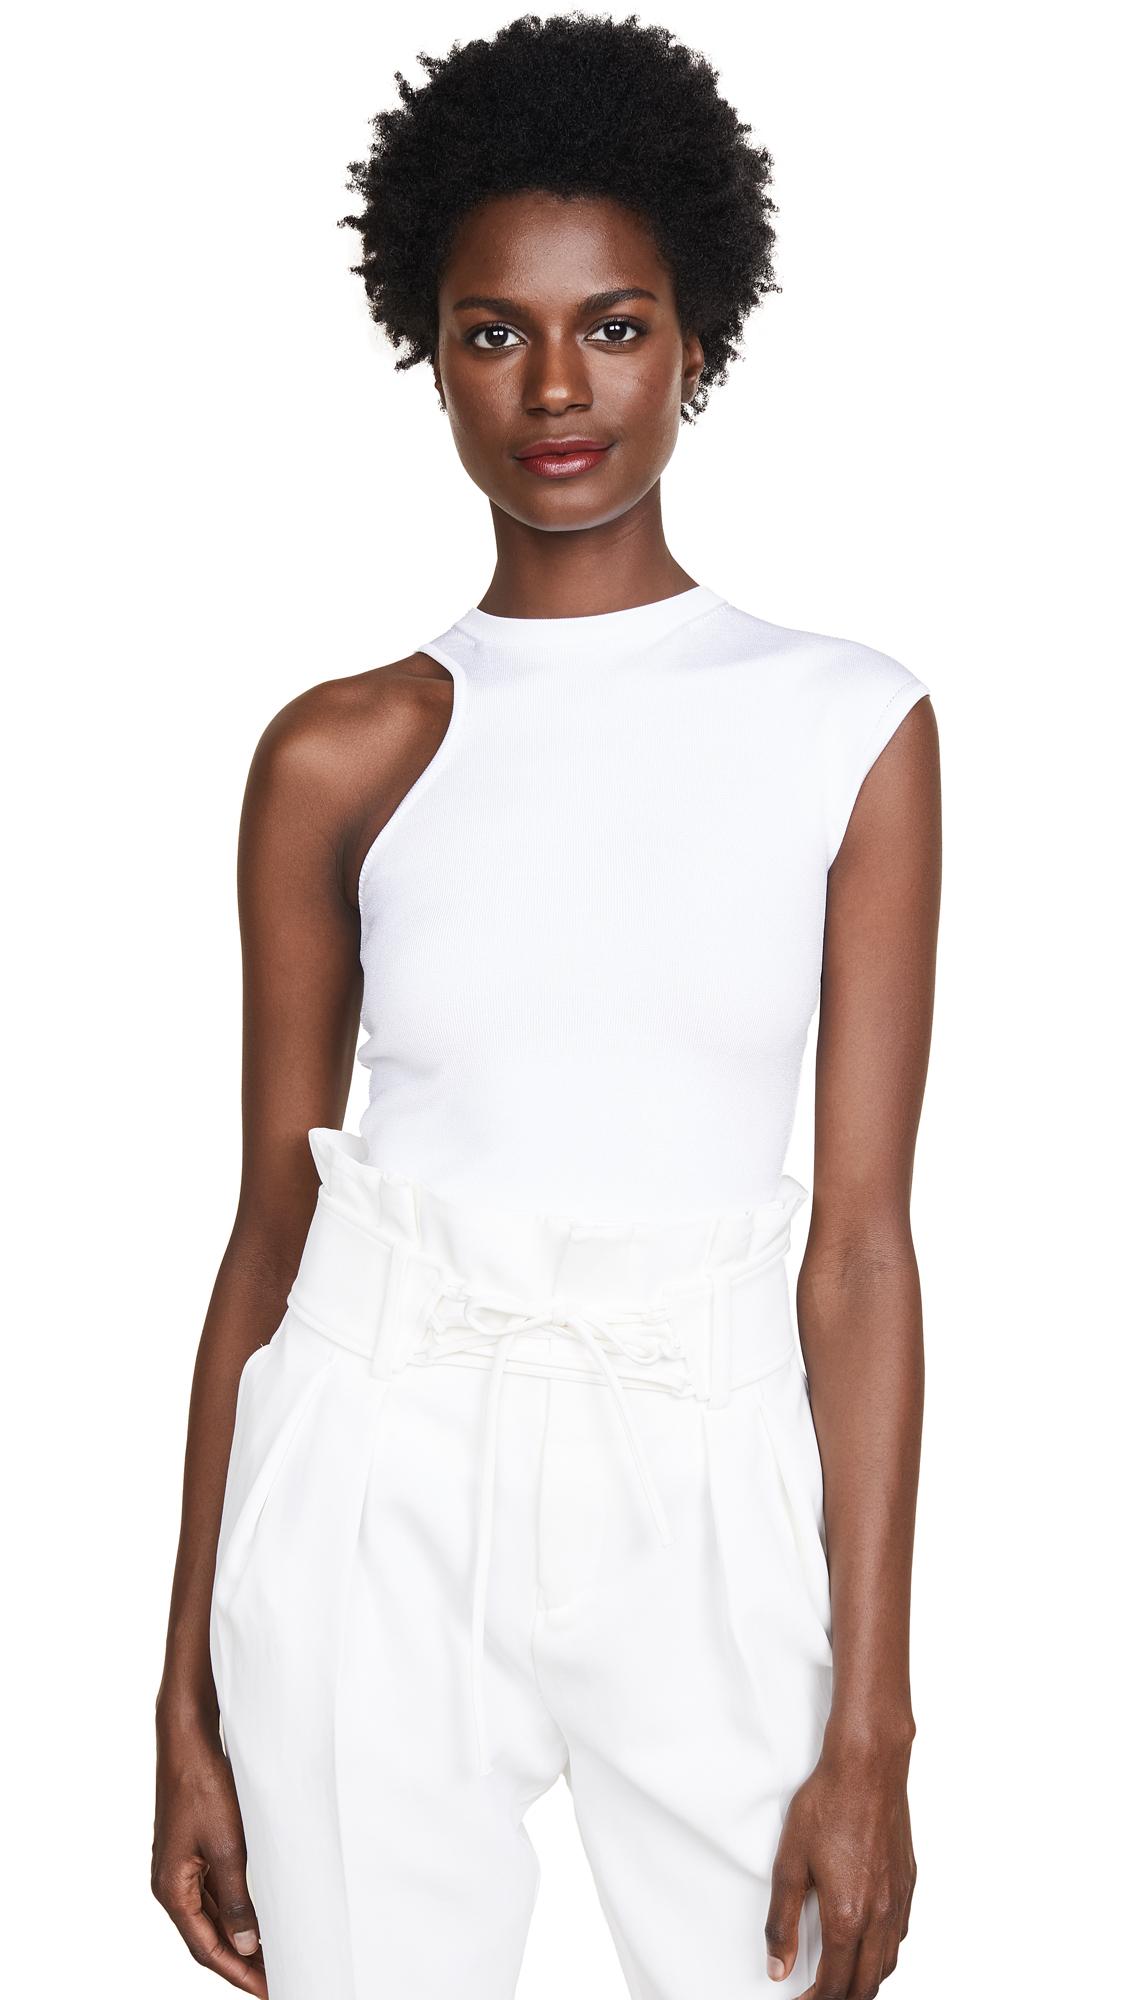 CUSHNIE ET OCHS One-Shoulder Cap-Sleeve Jersey Knit Top in White